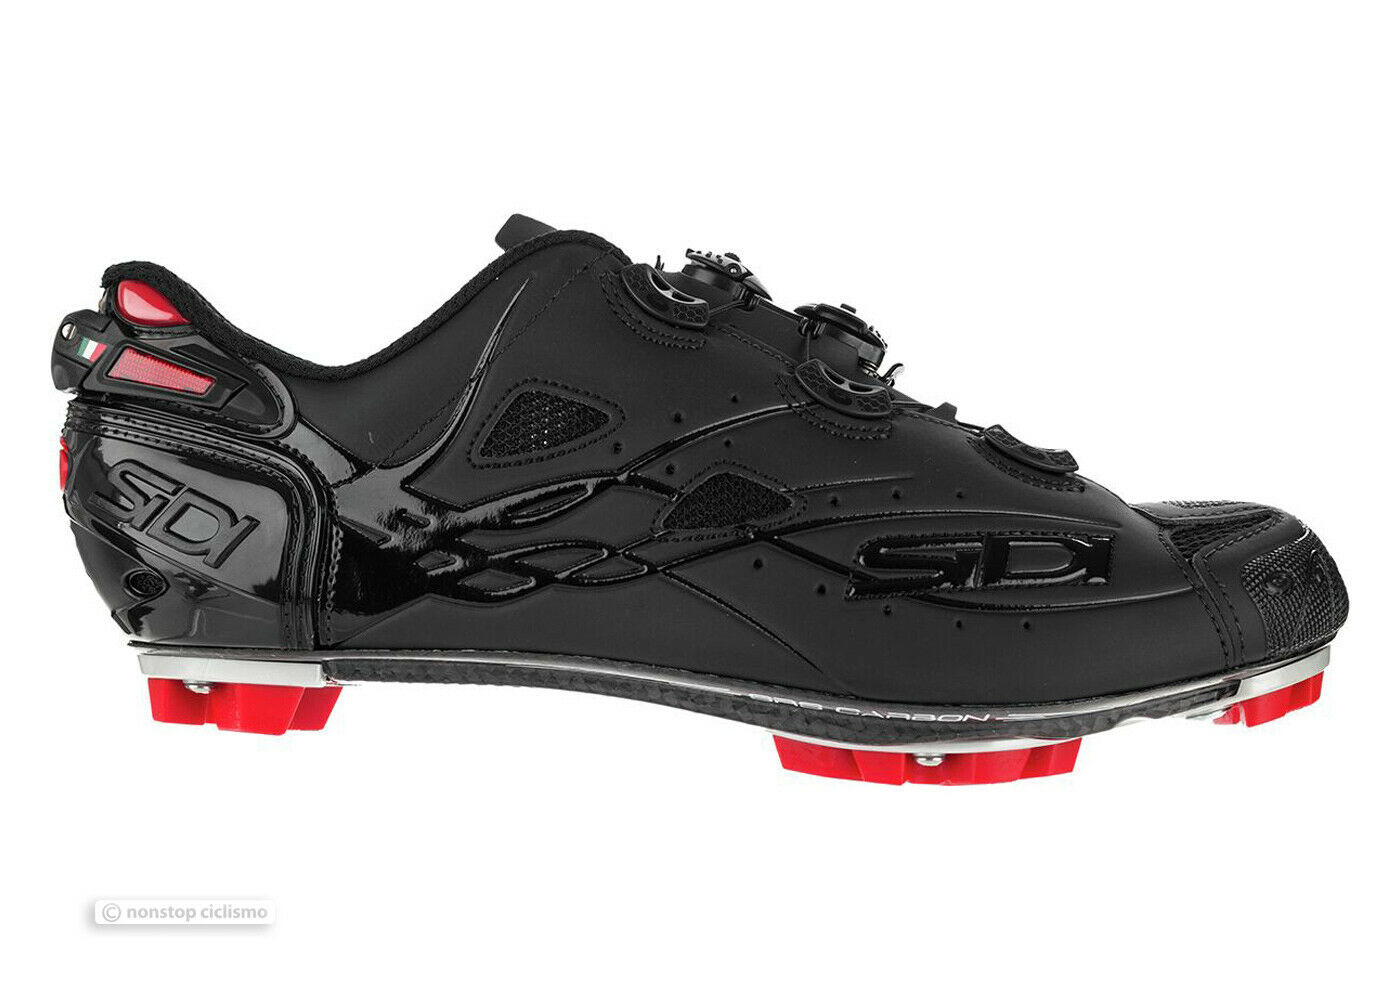 Neu 2020 Sidi MTB Tiger Carbon Mountainbike Schuhe: Total Schwarz